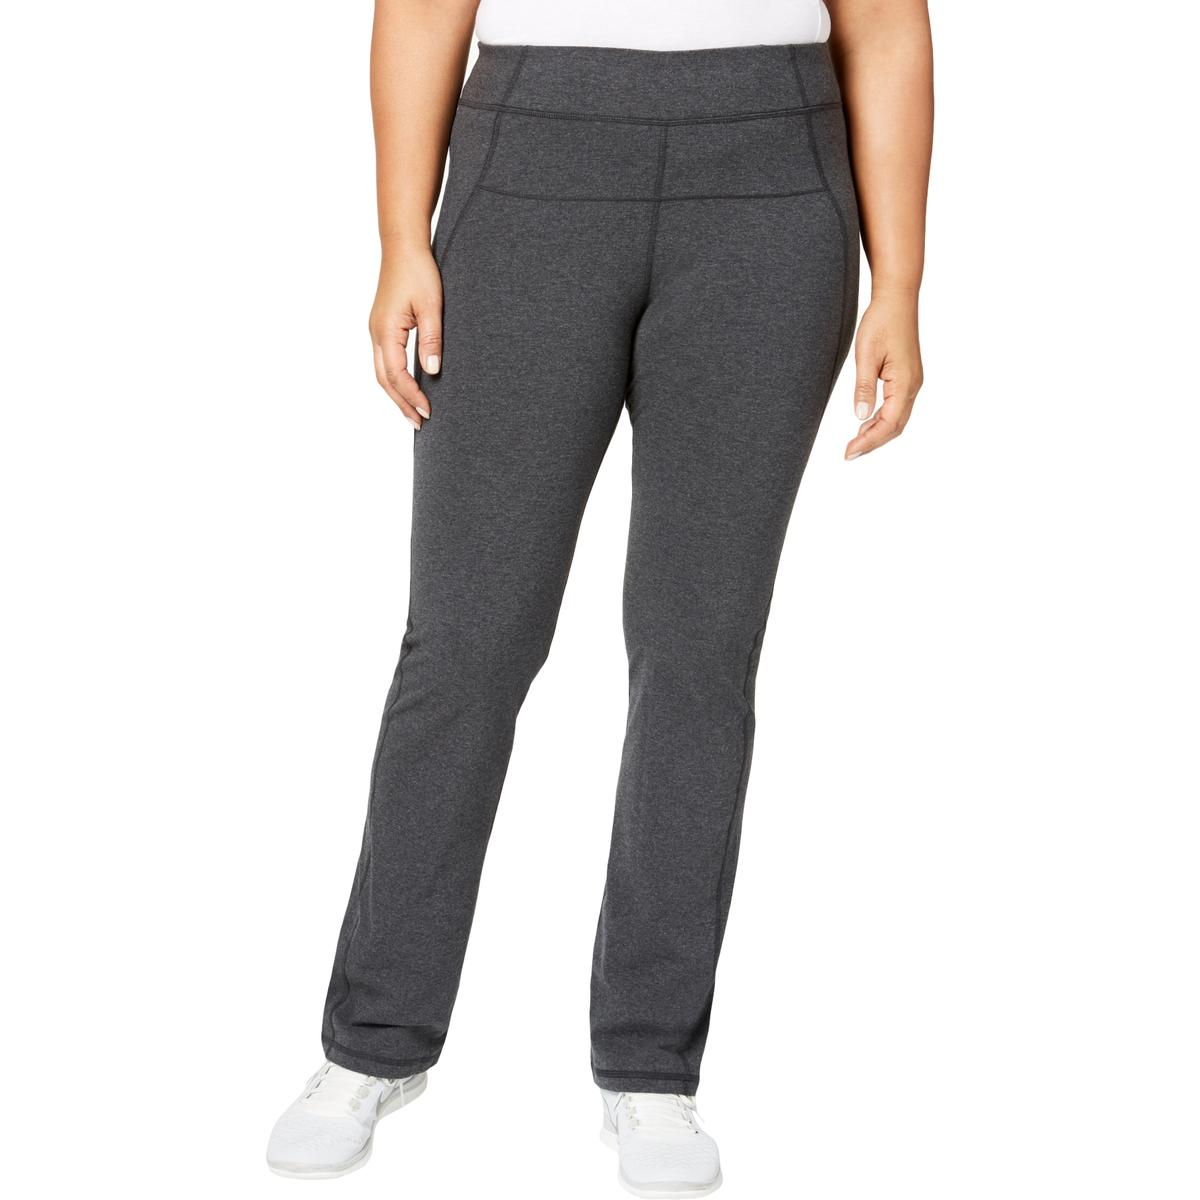 dd6931a9e37 Details about Calvin Klein Performance Womens Fitness Workout Athletic Leggings  Plus BHFO 1819